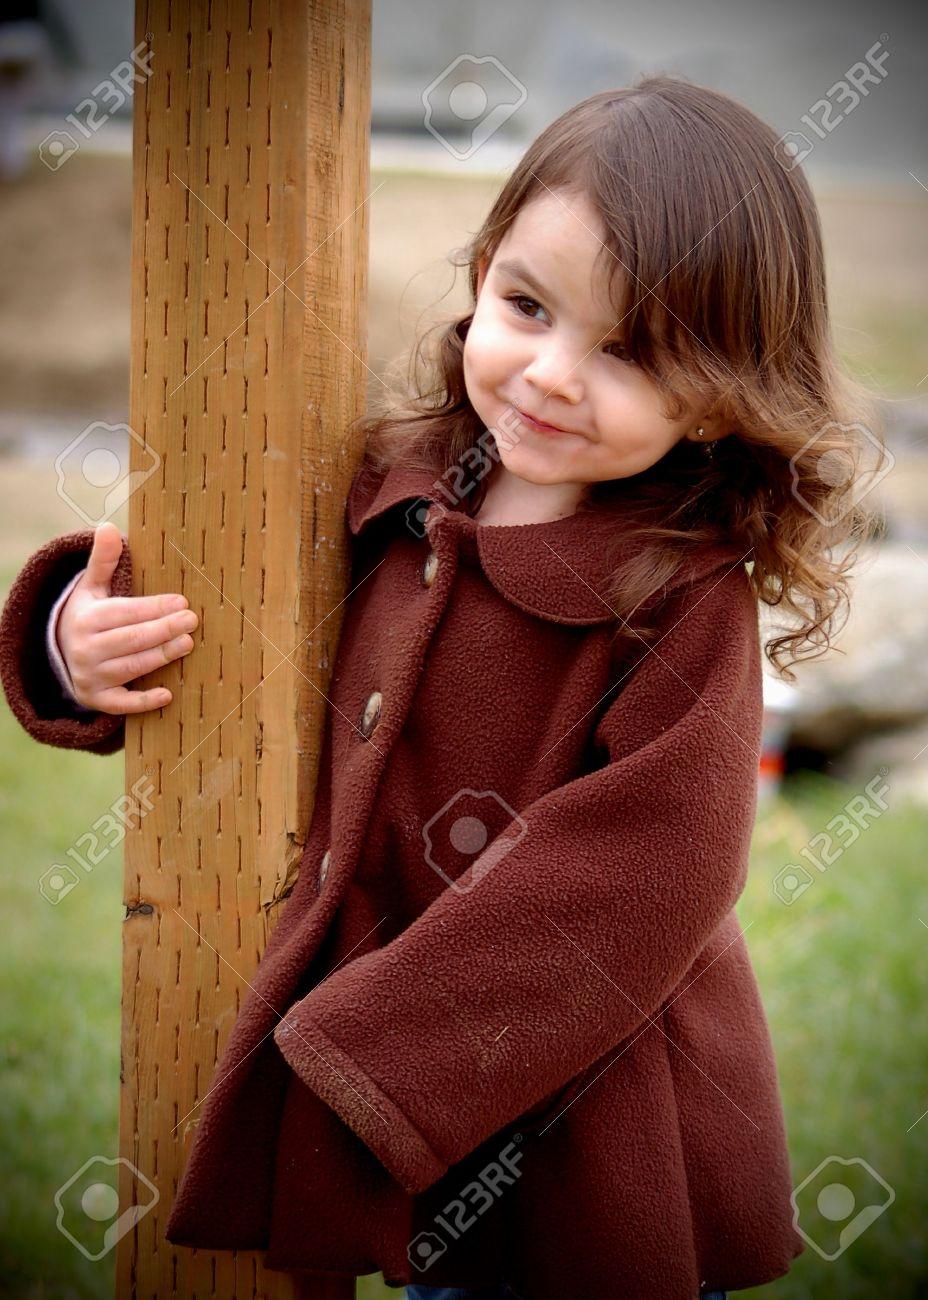 smile cute girl pic